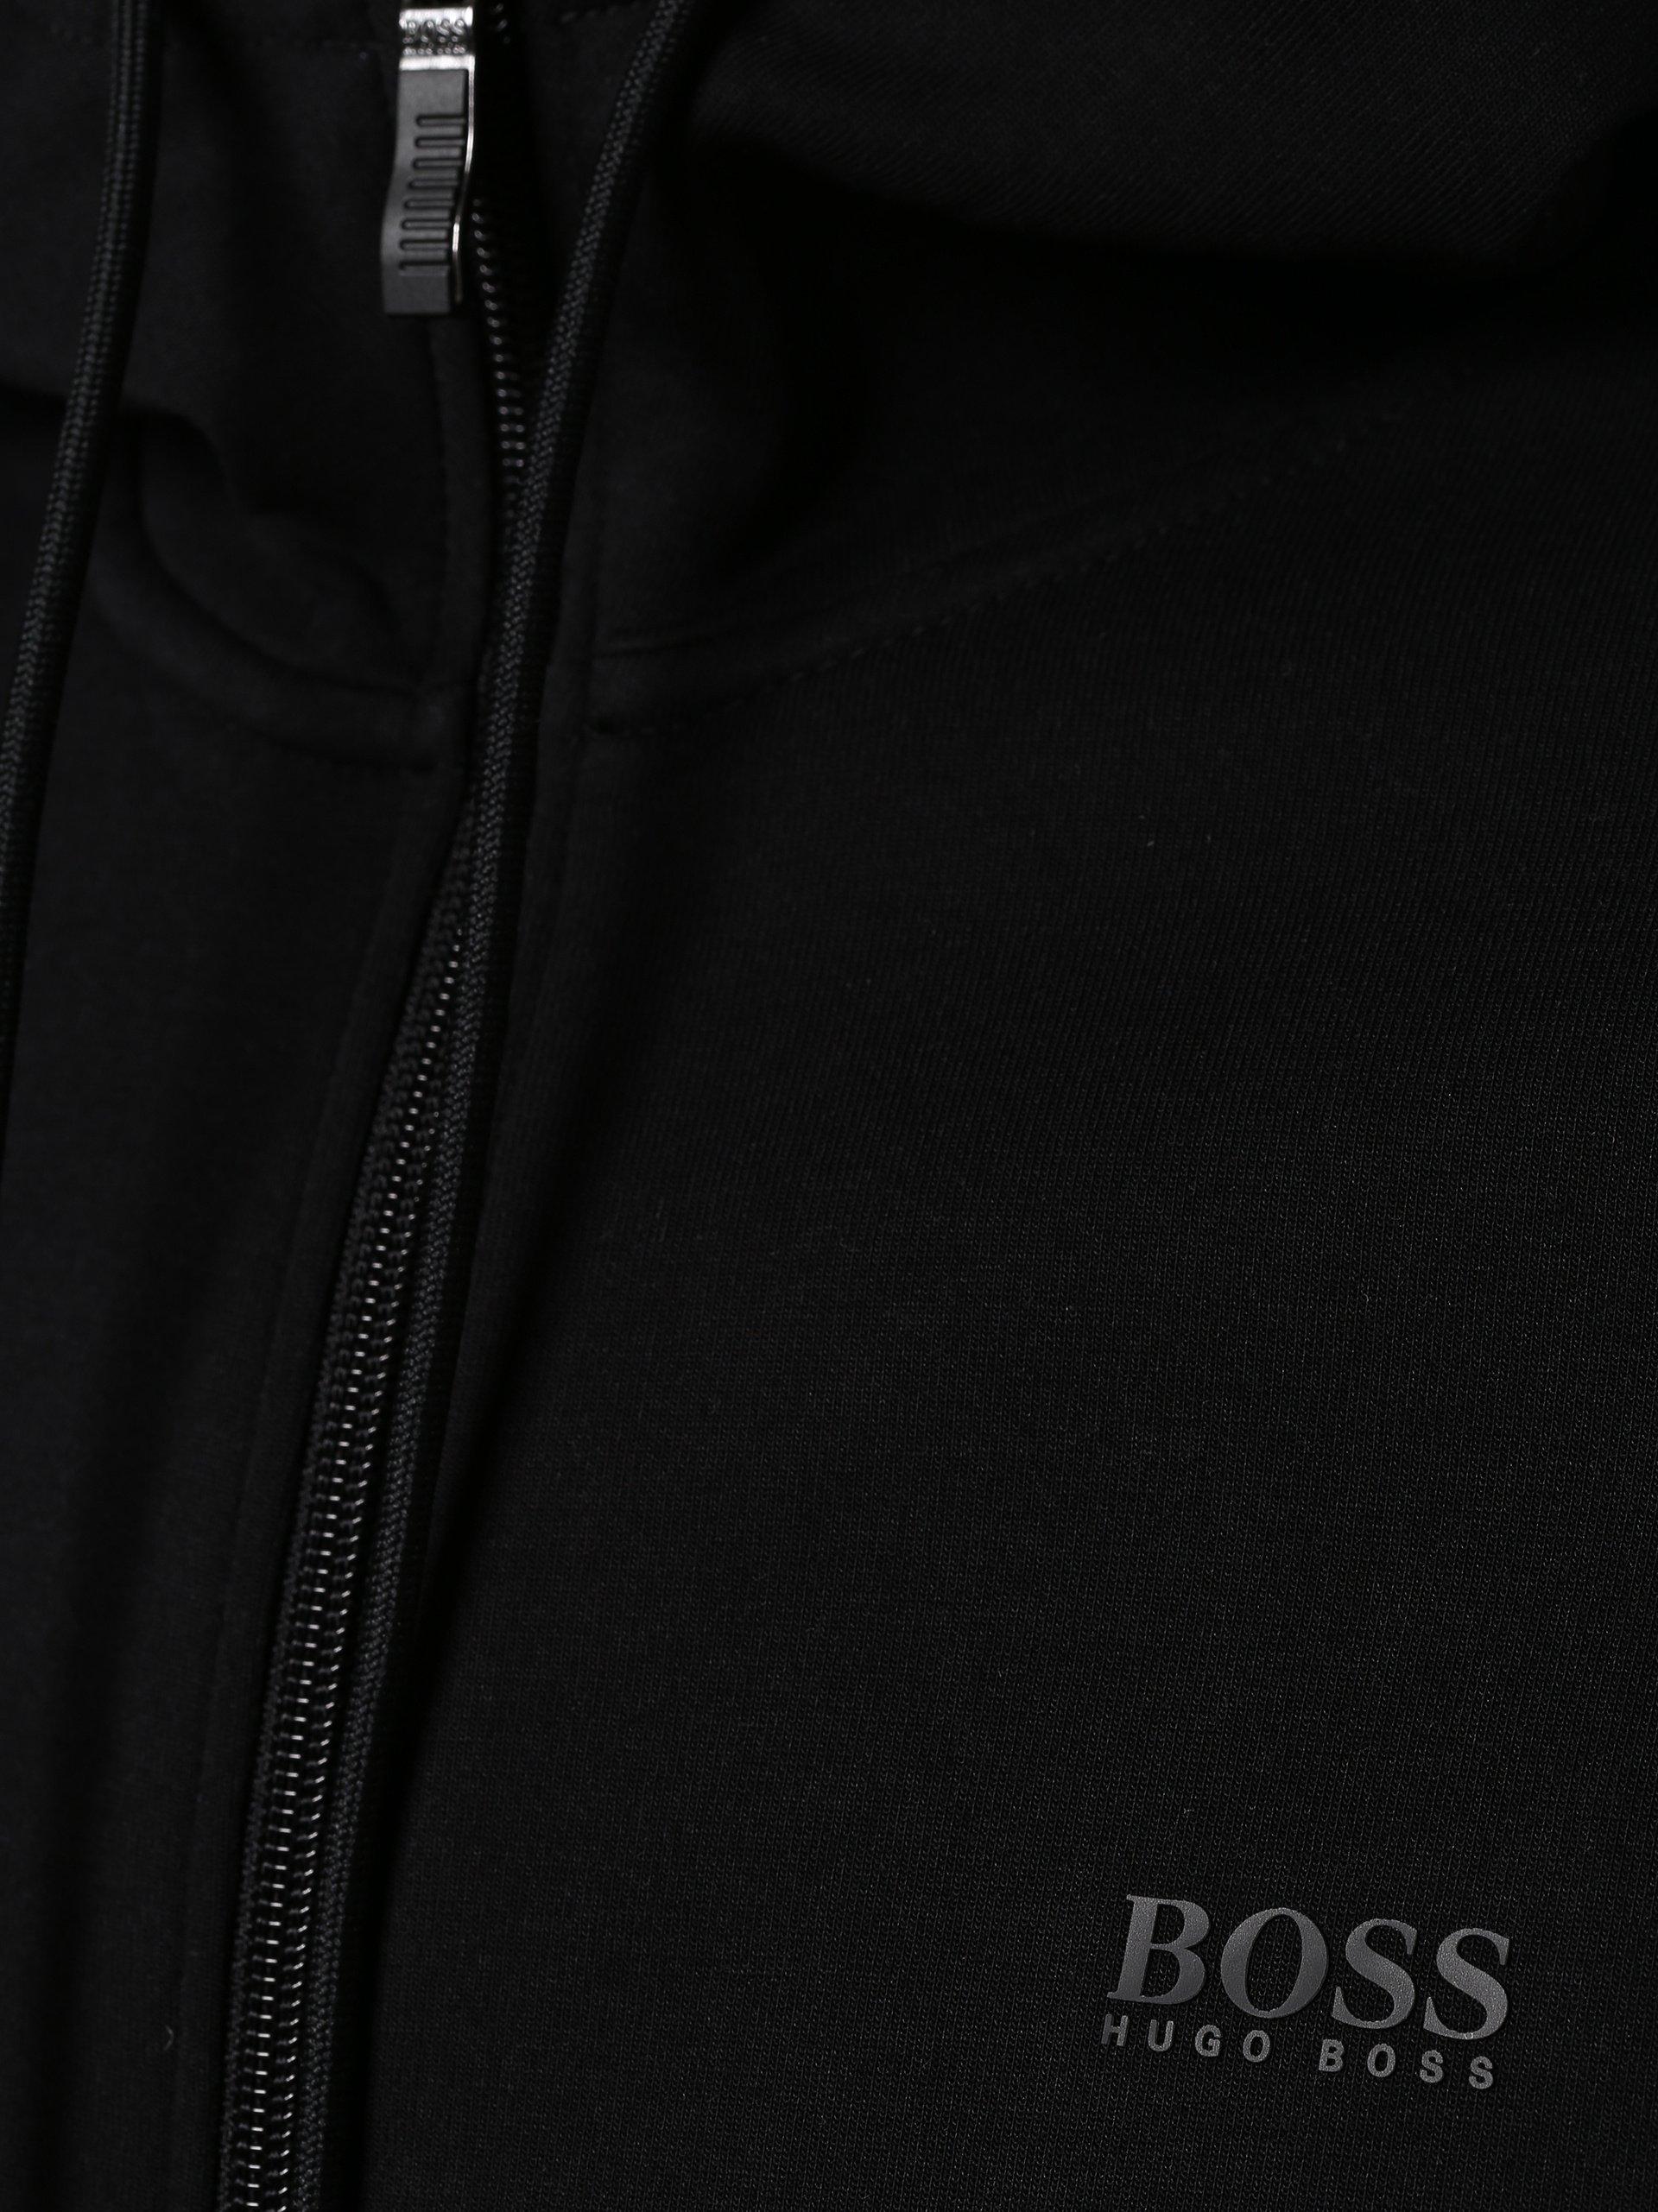 BOSS Athleisure Męska bluza rozpinana – Saggy X